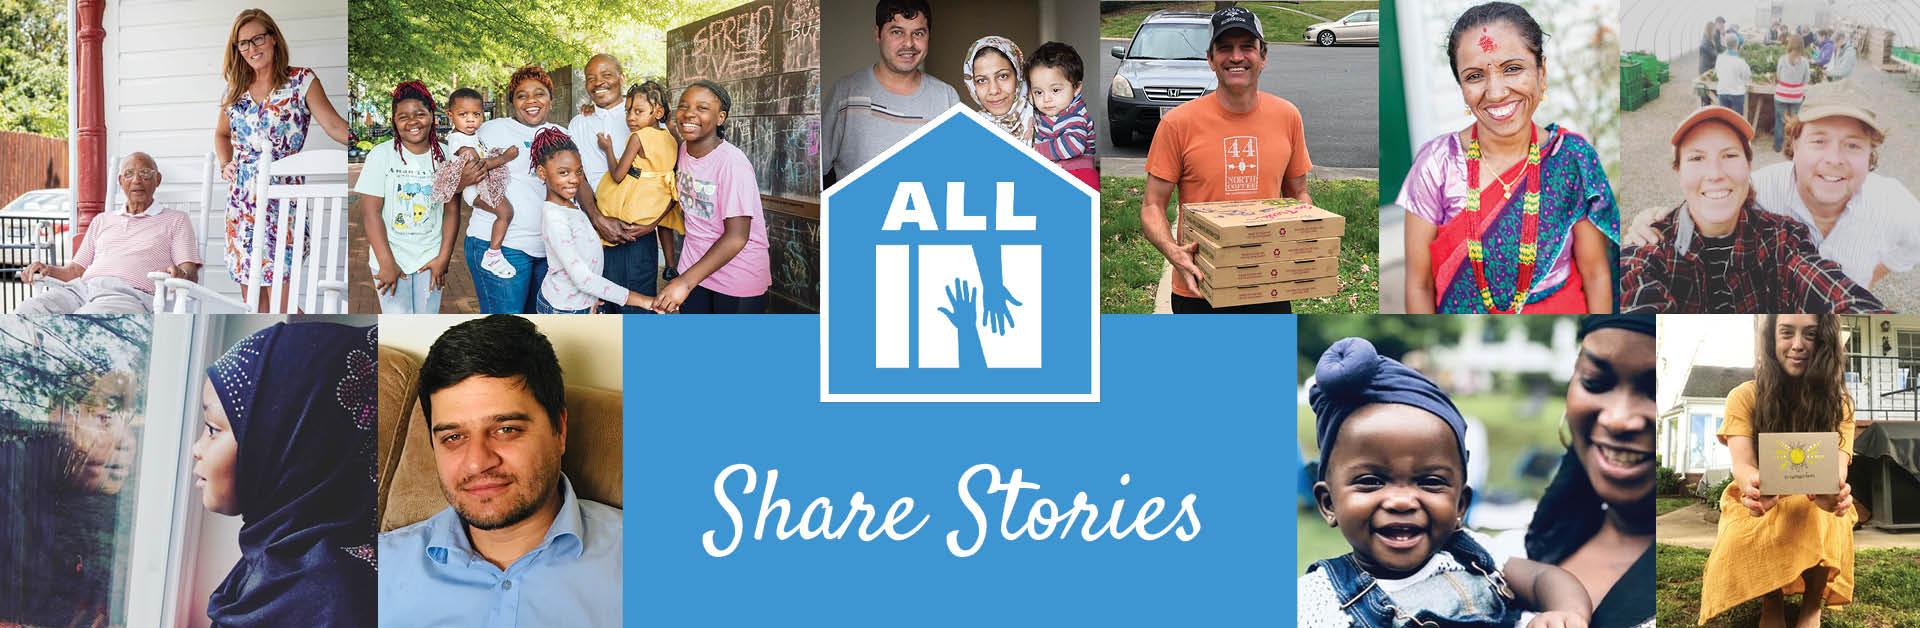 All In Hero Image_ShareStories